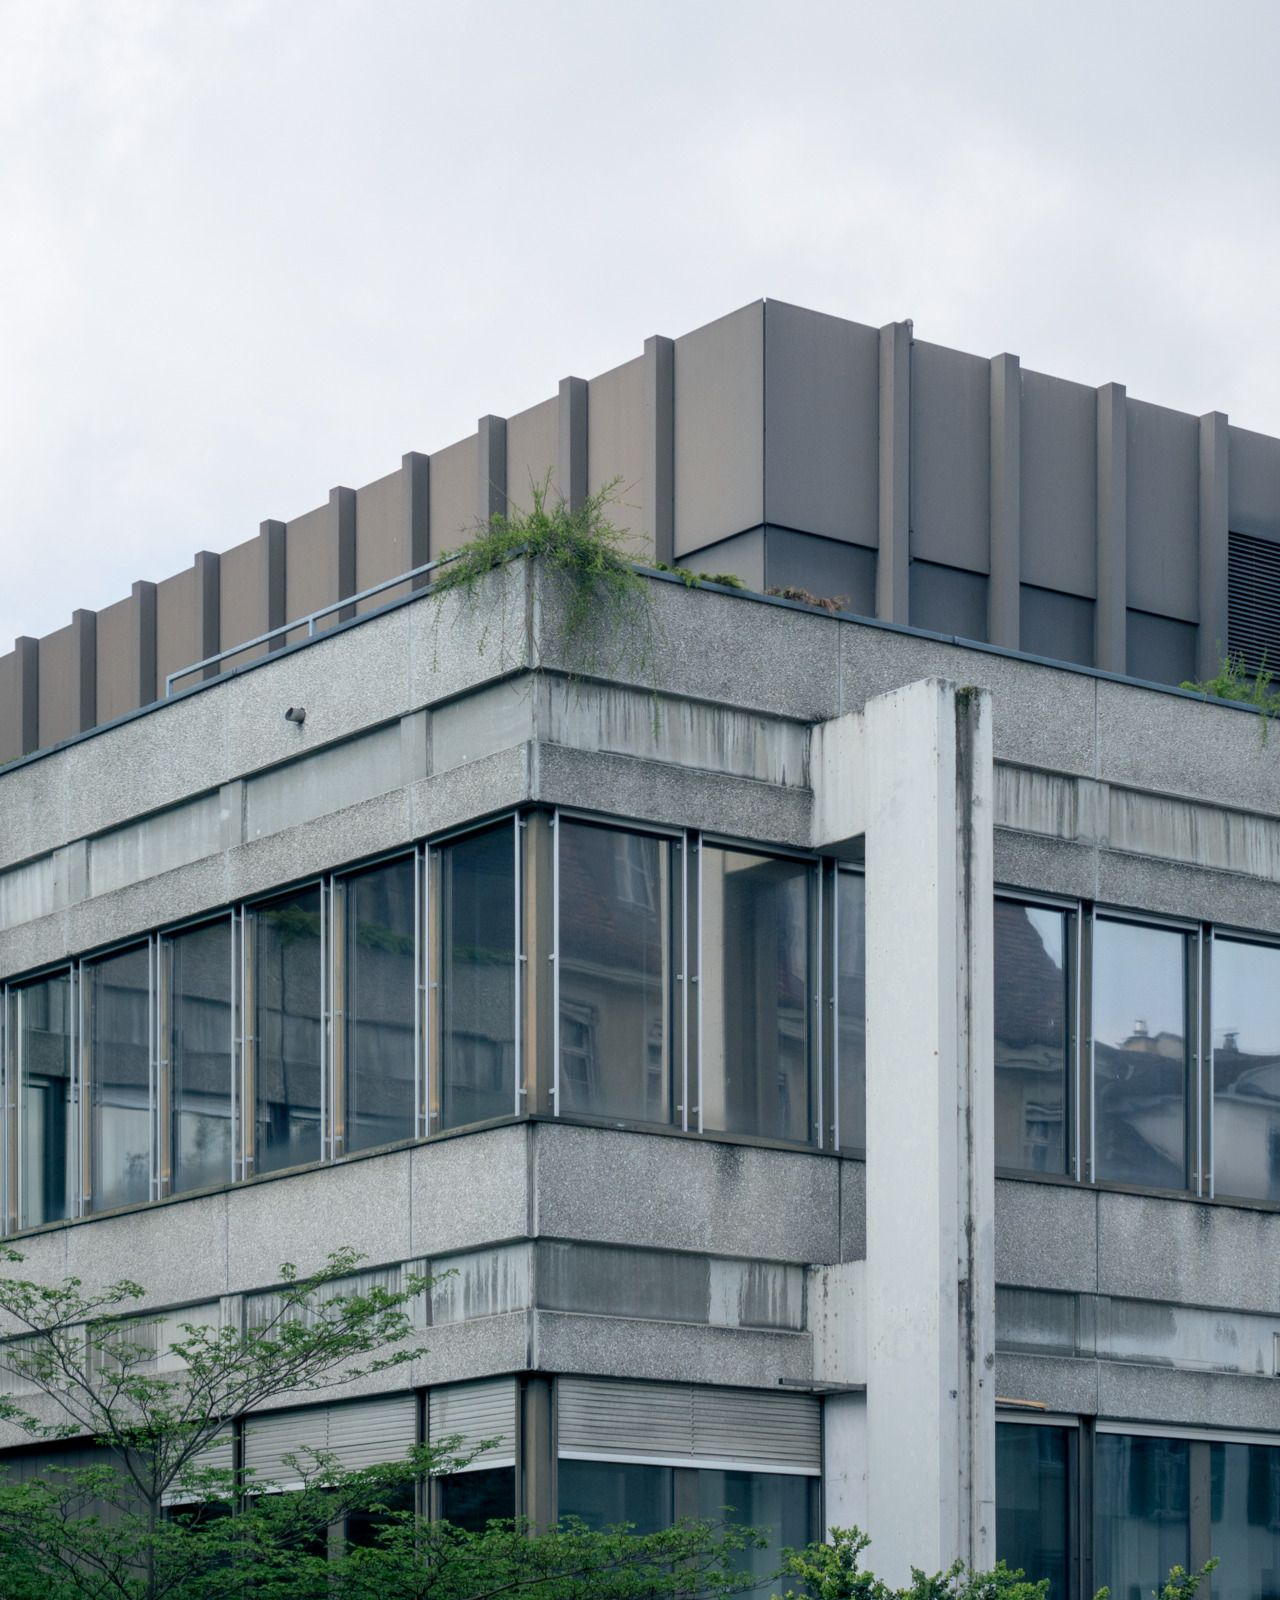 Universitätsspital Klinikum 2 Basel (1978)  by Suter + Suter Architekten  Ralf Streithorst Photography